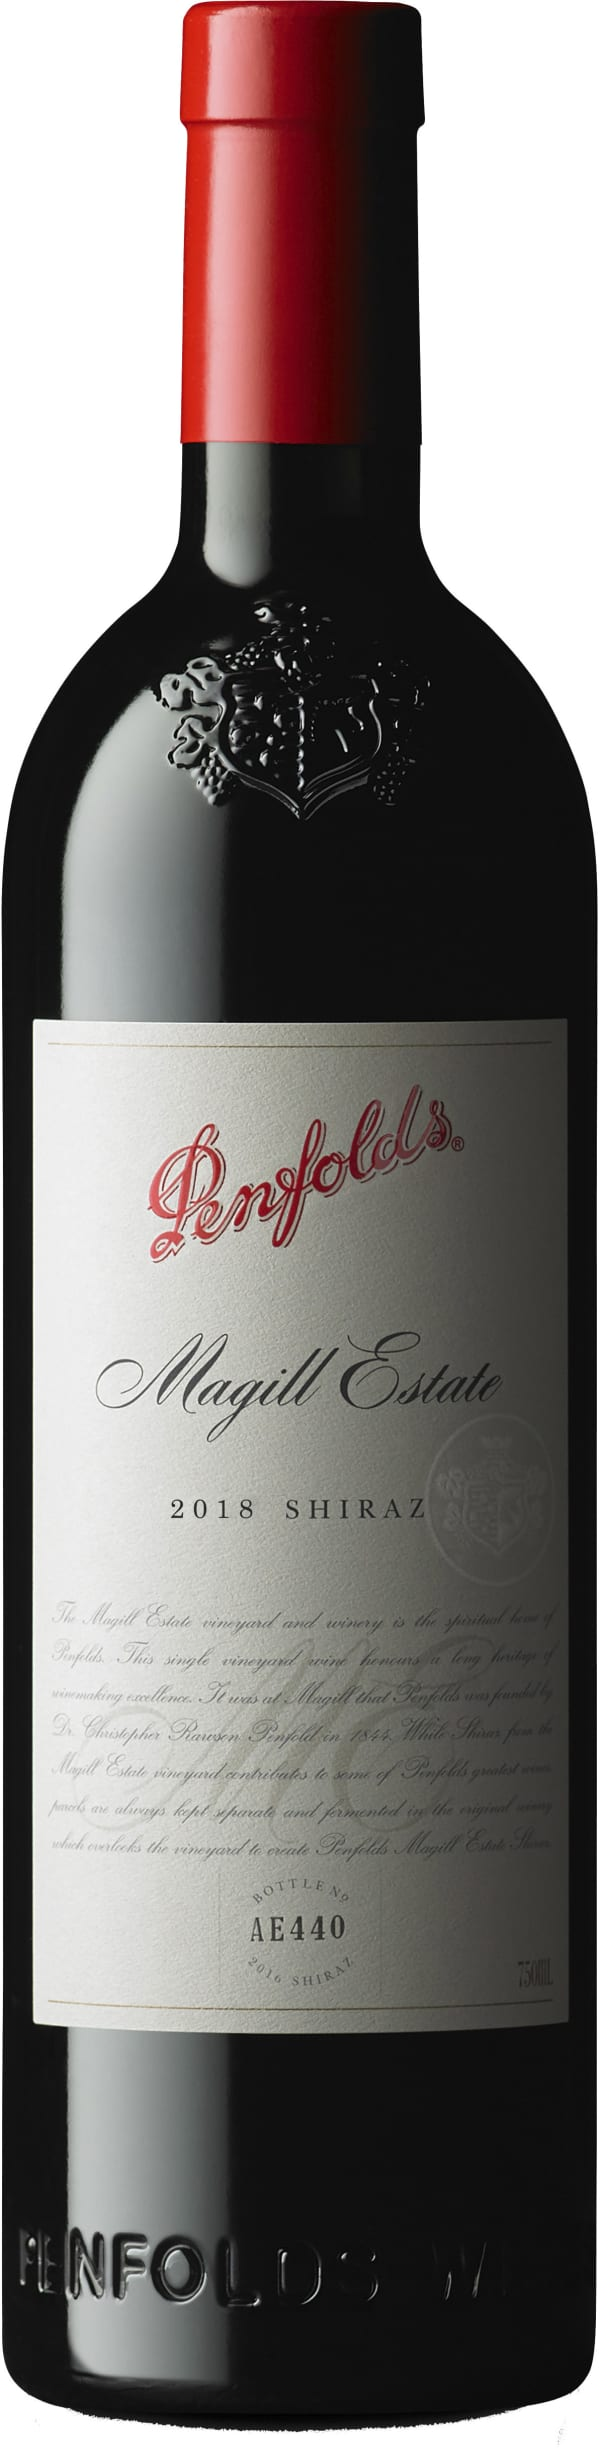 Penfolds Magill Estate Shiraz 2018